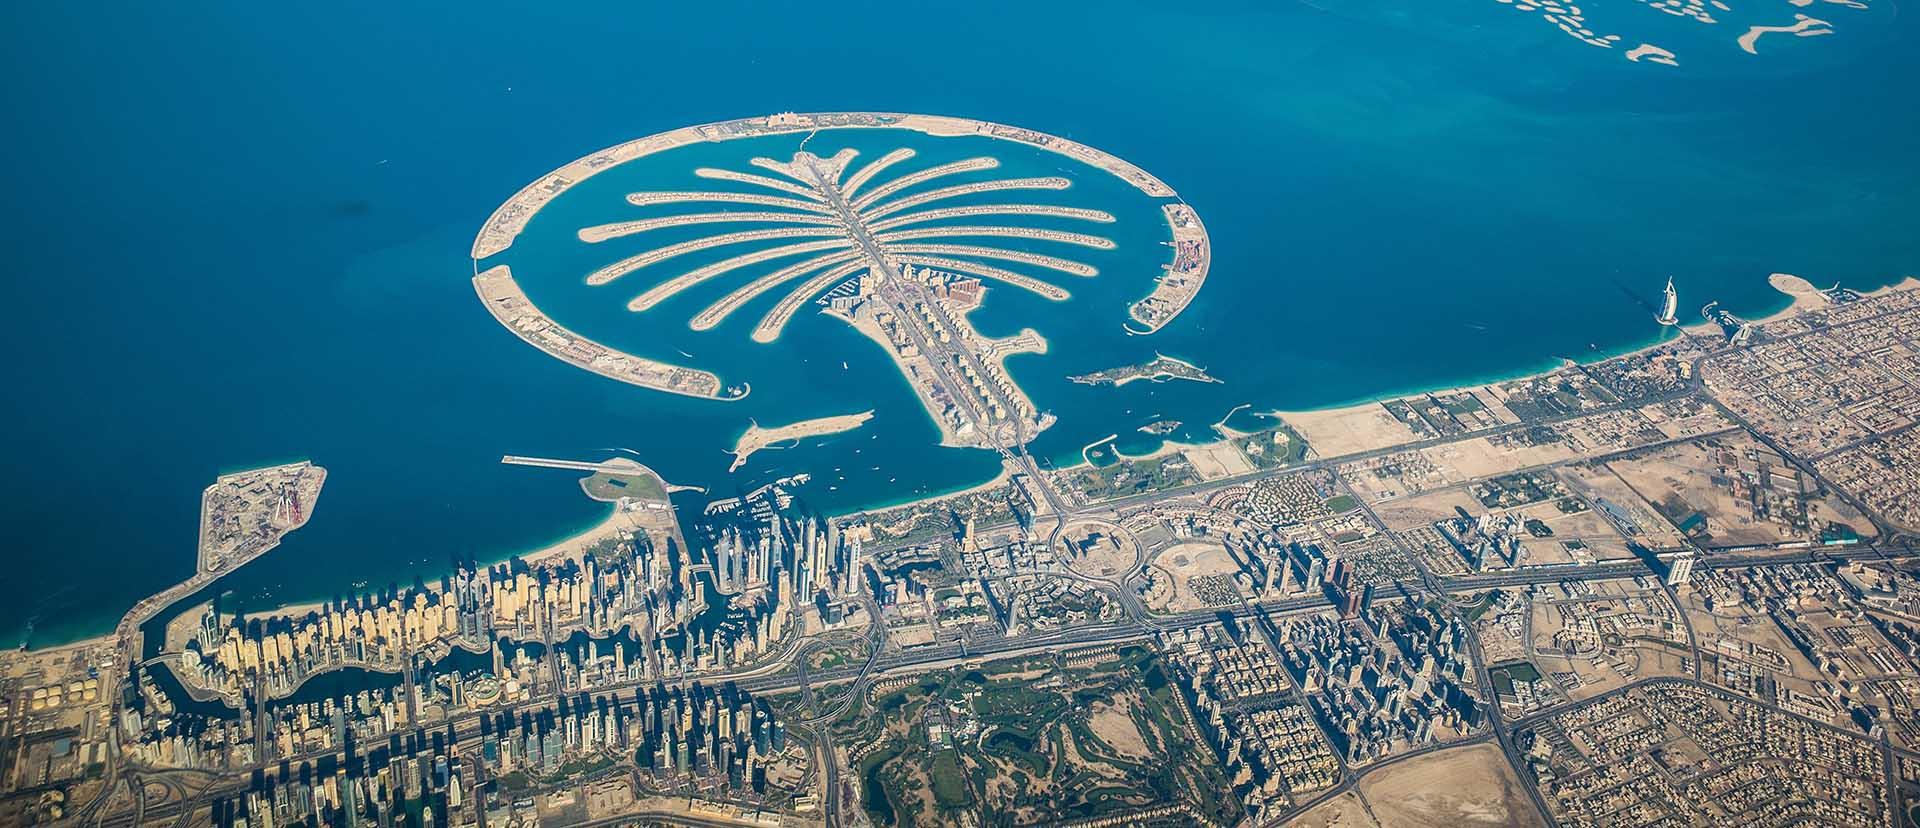 Properties for Sale on Palm Jumeirah, Dubai, UAE